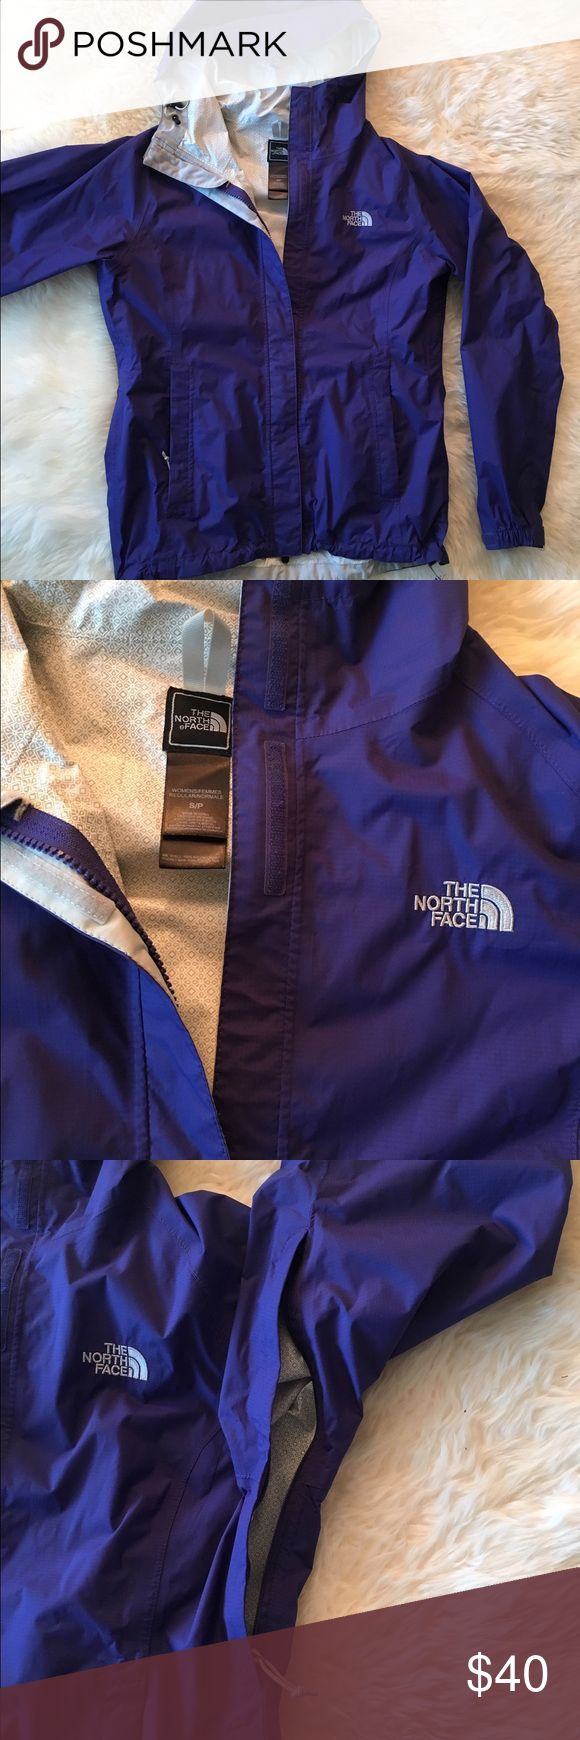 North Face Rain Jacket HyVent 2.5L Beautiful Purple/Blue rain jacket from The North Face. Cute inside pattern. Works great. No damage. Zipper vents. North Face Jackets & Coats Utility Jackets